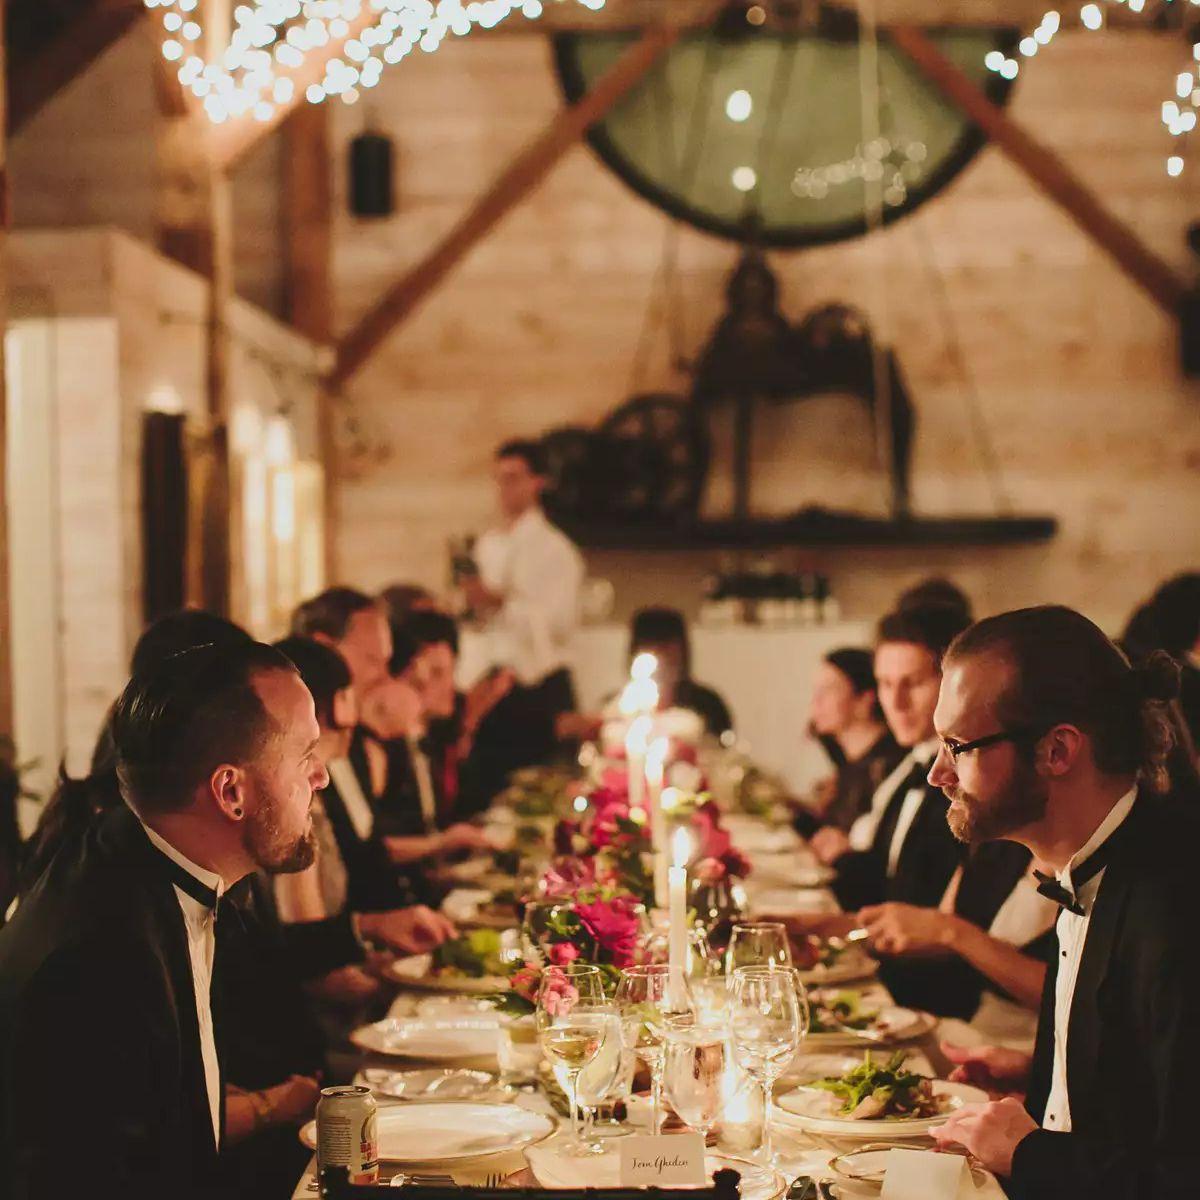 Family style serving dinner for intimacy